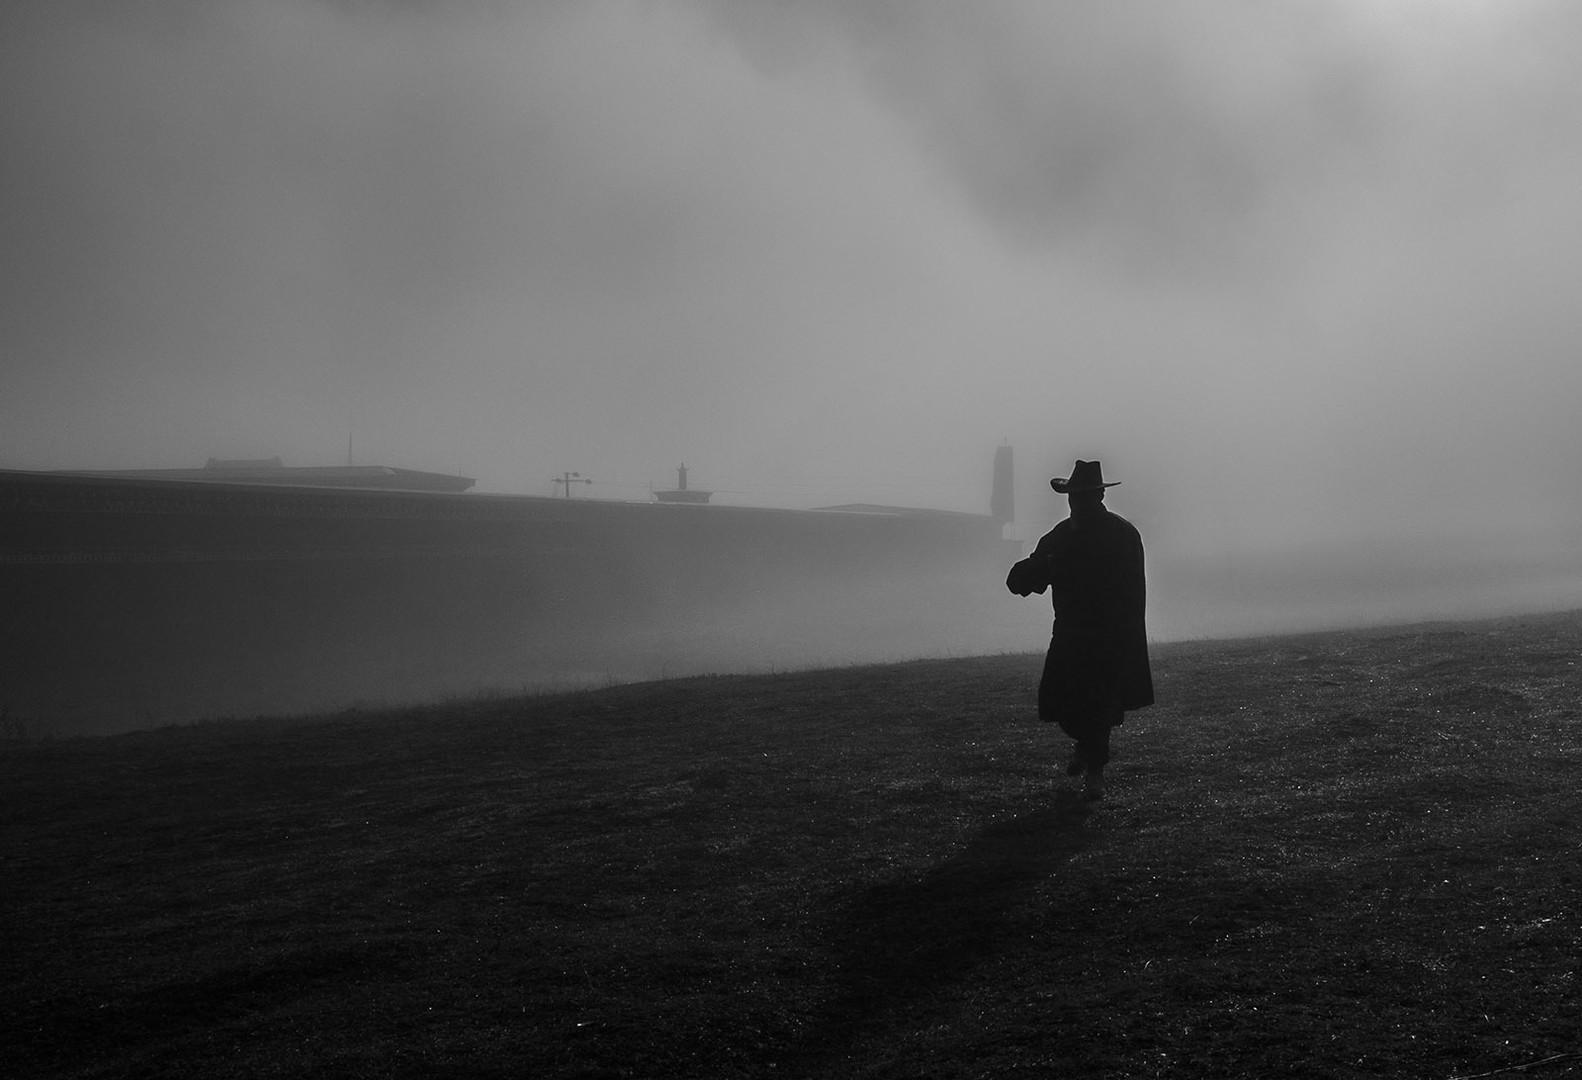 man in long black coat